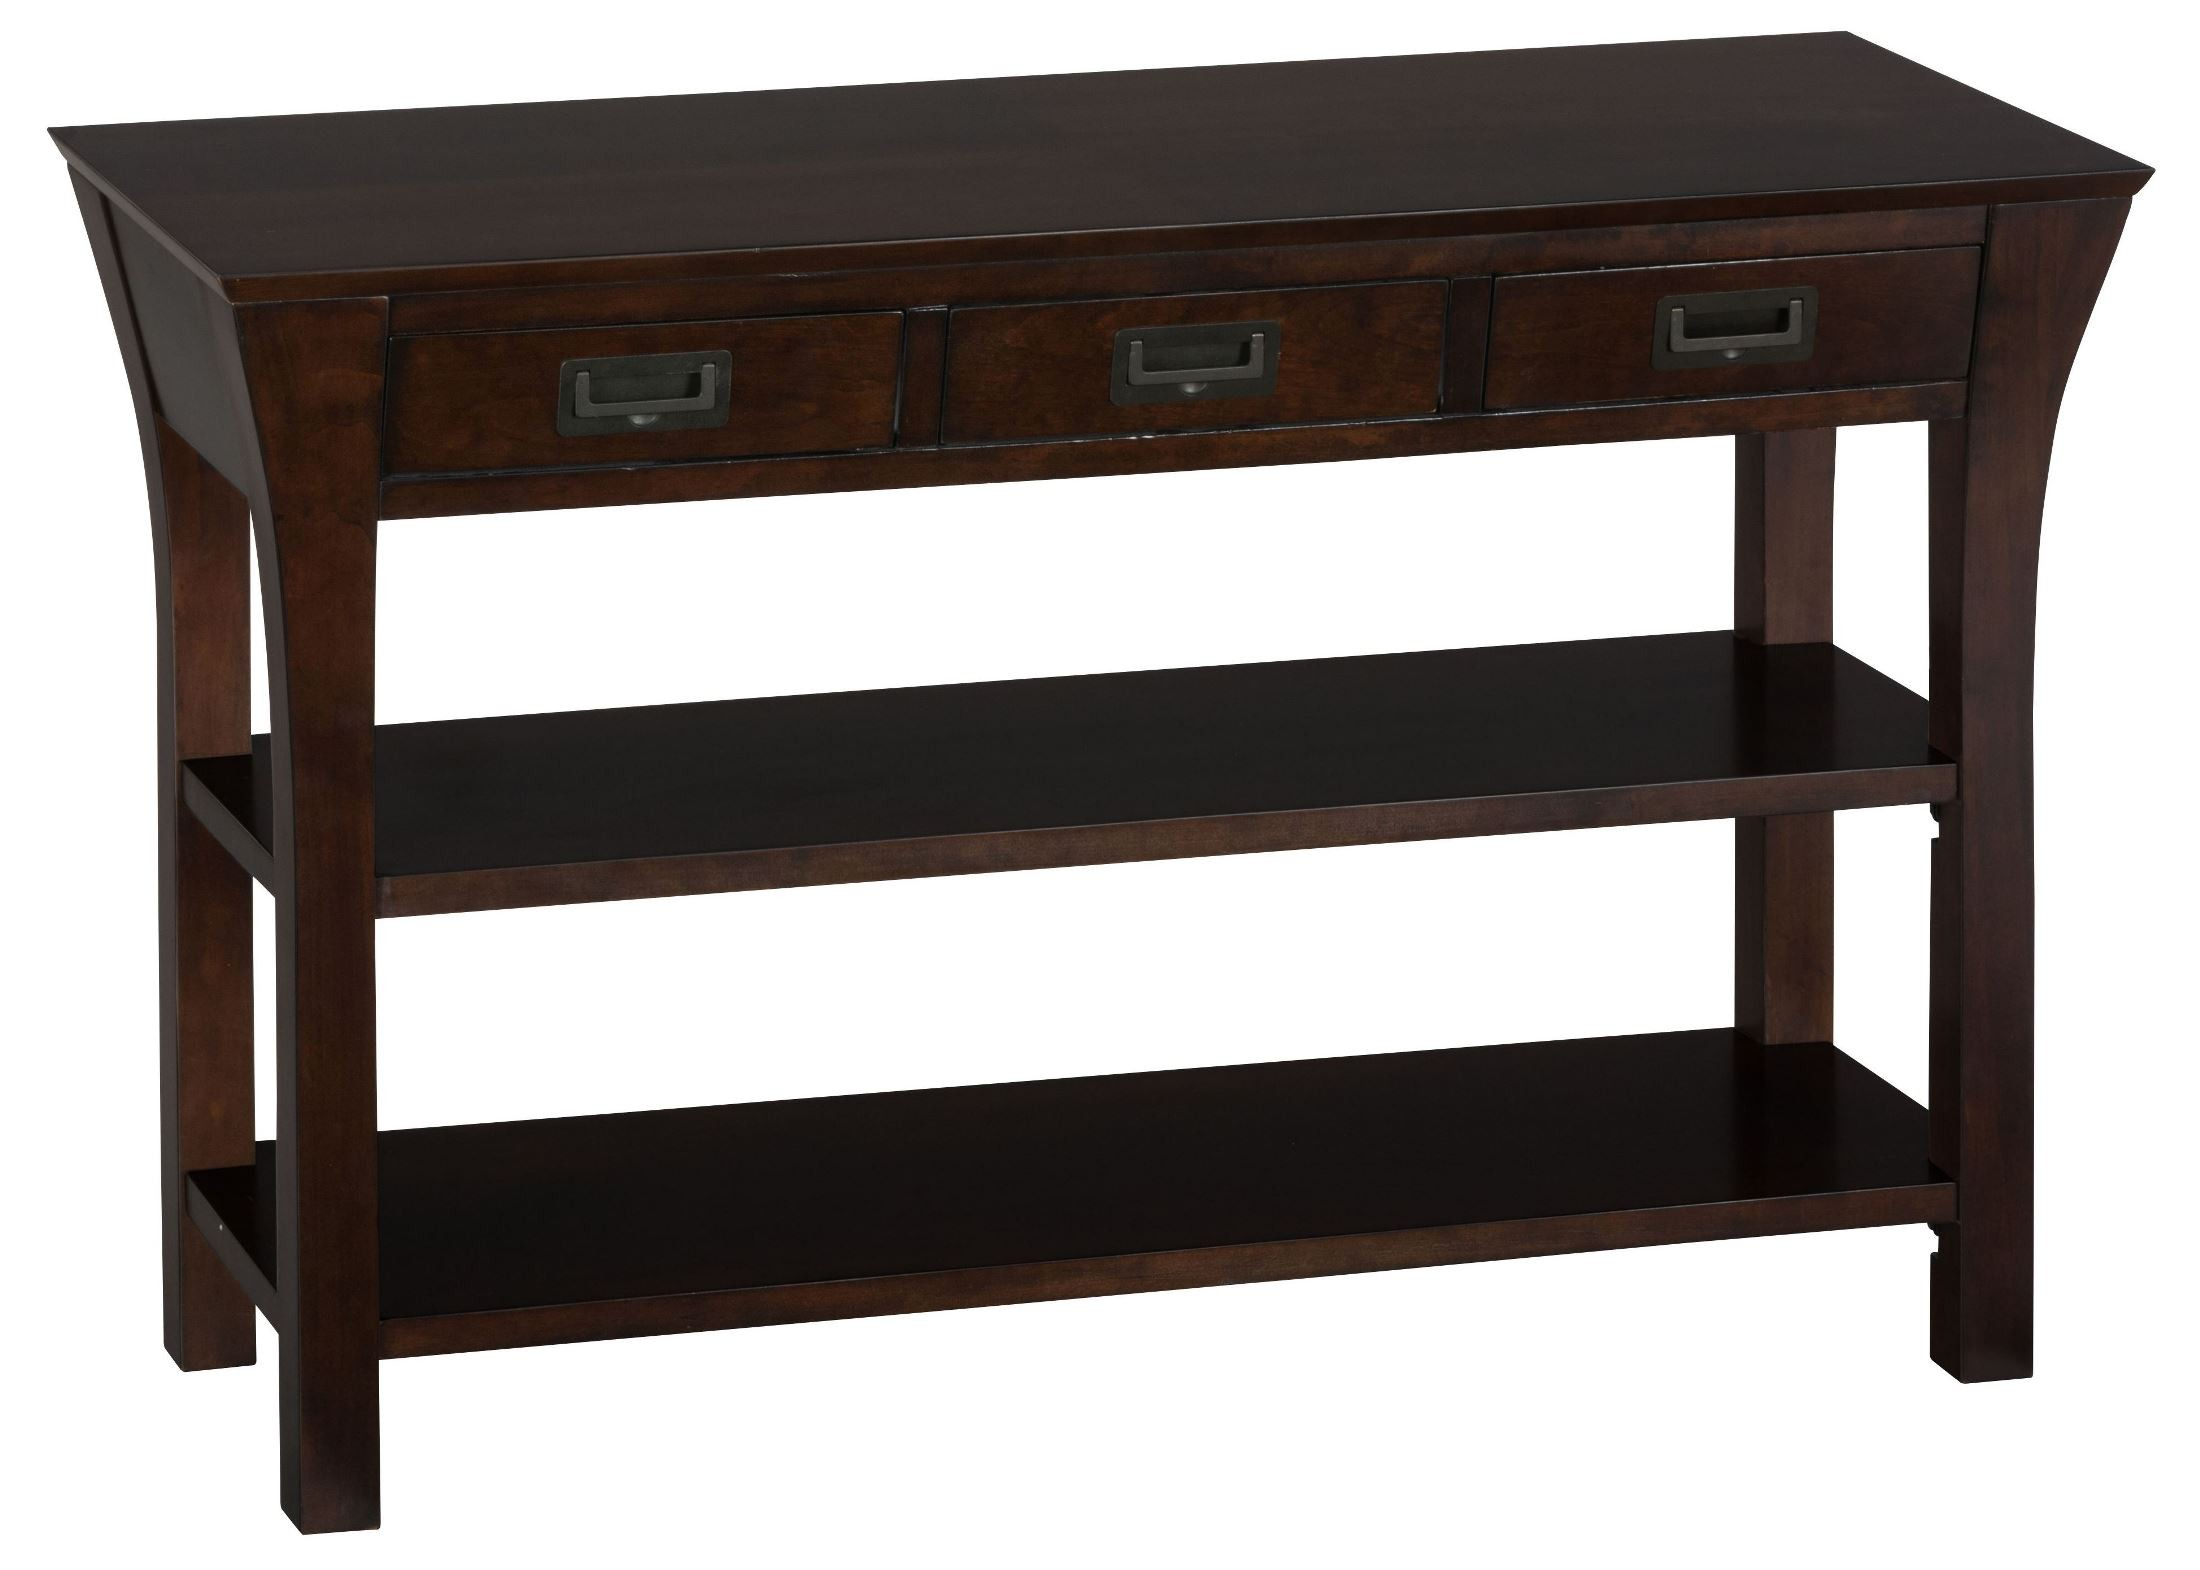 dark sofa tables sectional sofas okc artisan brown media table from jofran coleman